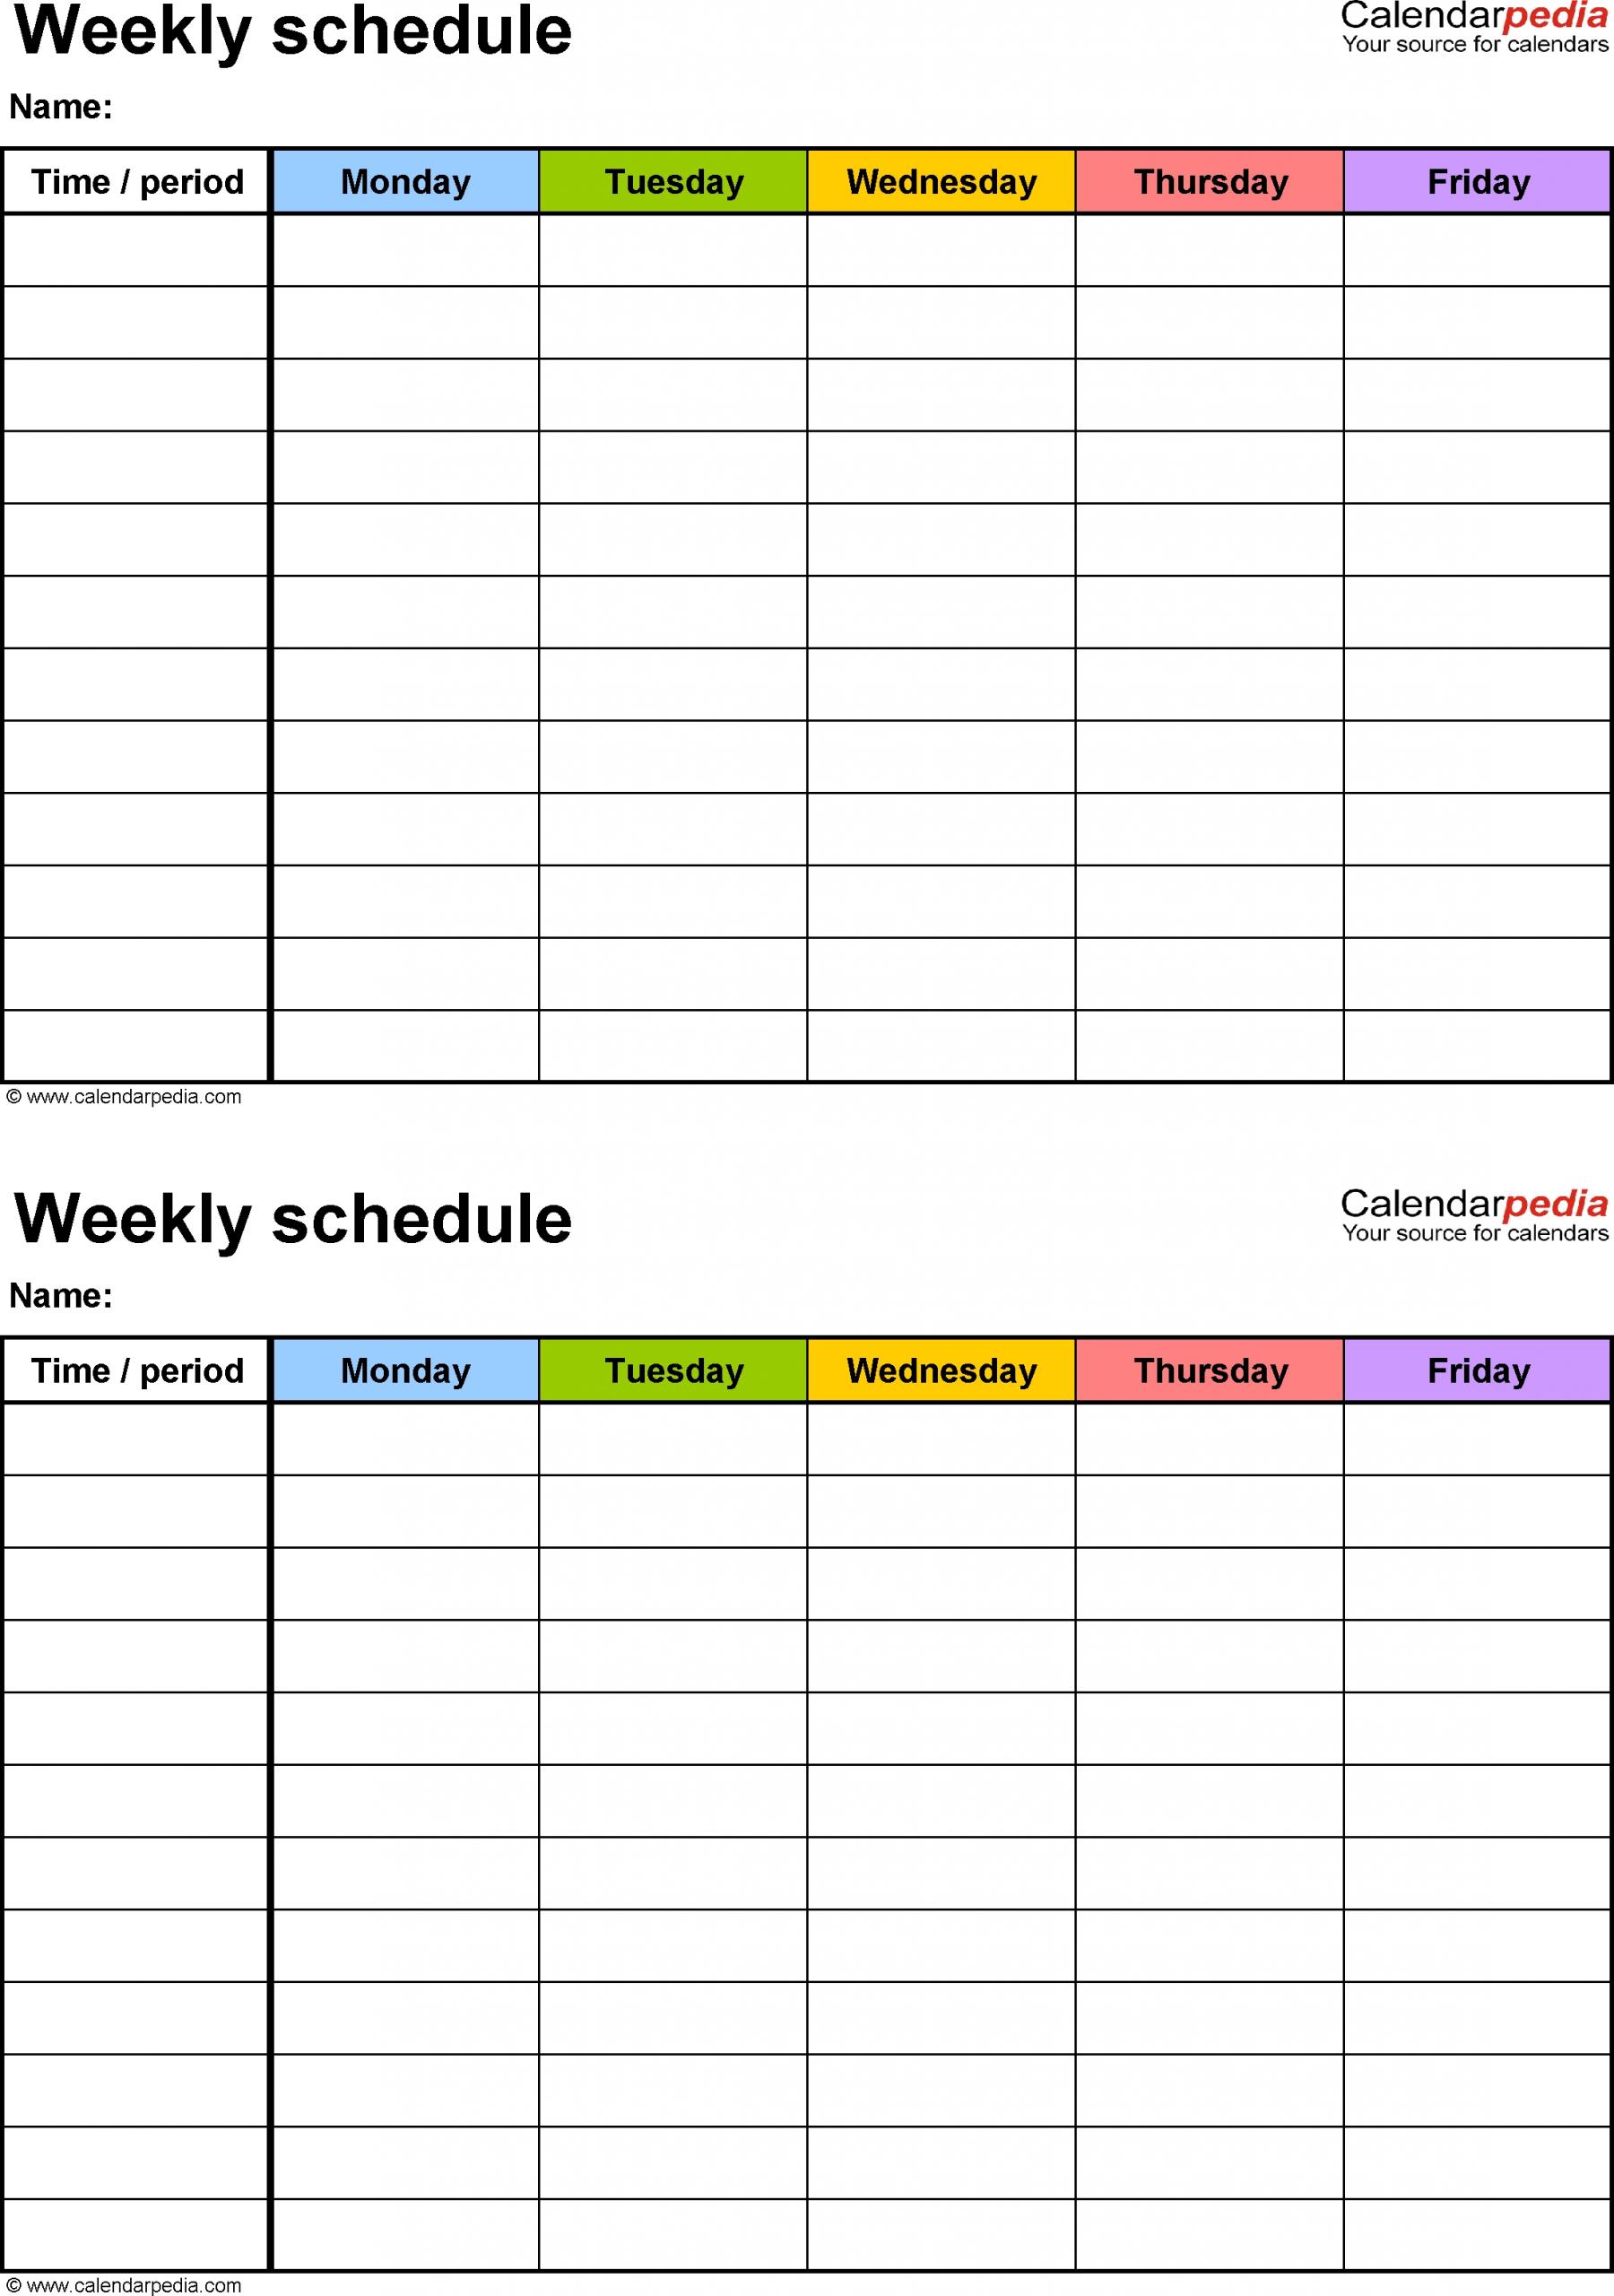 Printable Weekly Schedule Monday Thru Friday – Calendar Printable Template For A Schedule Monday To Friday